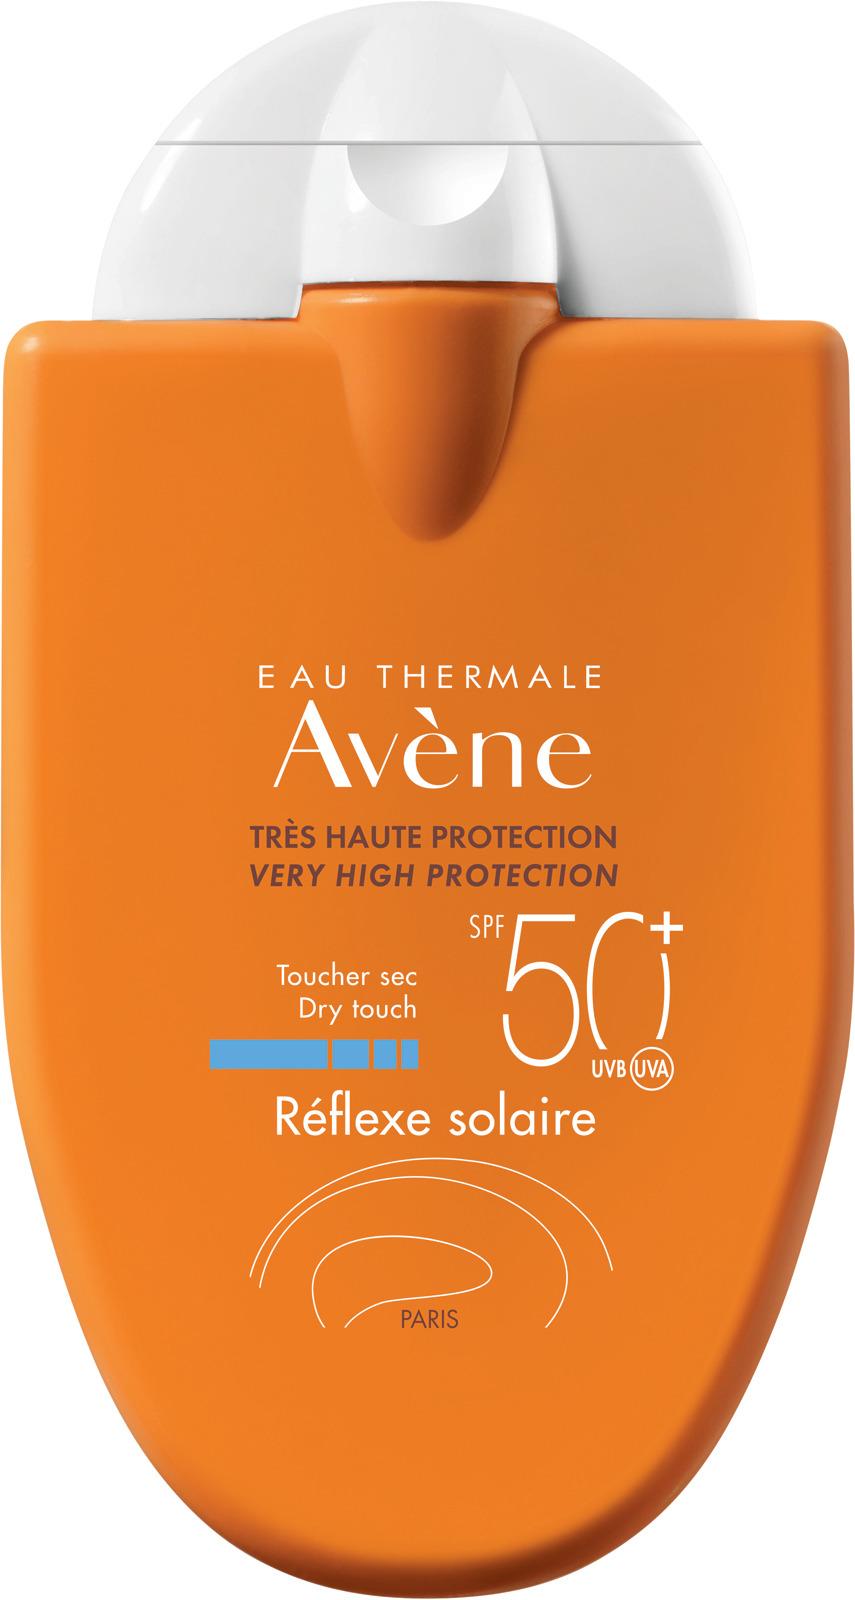 Avene Солнцезащитная эмульсия SPF50+, 30 мл